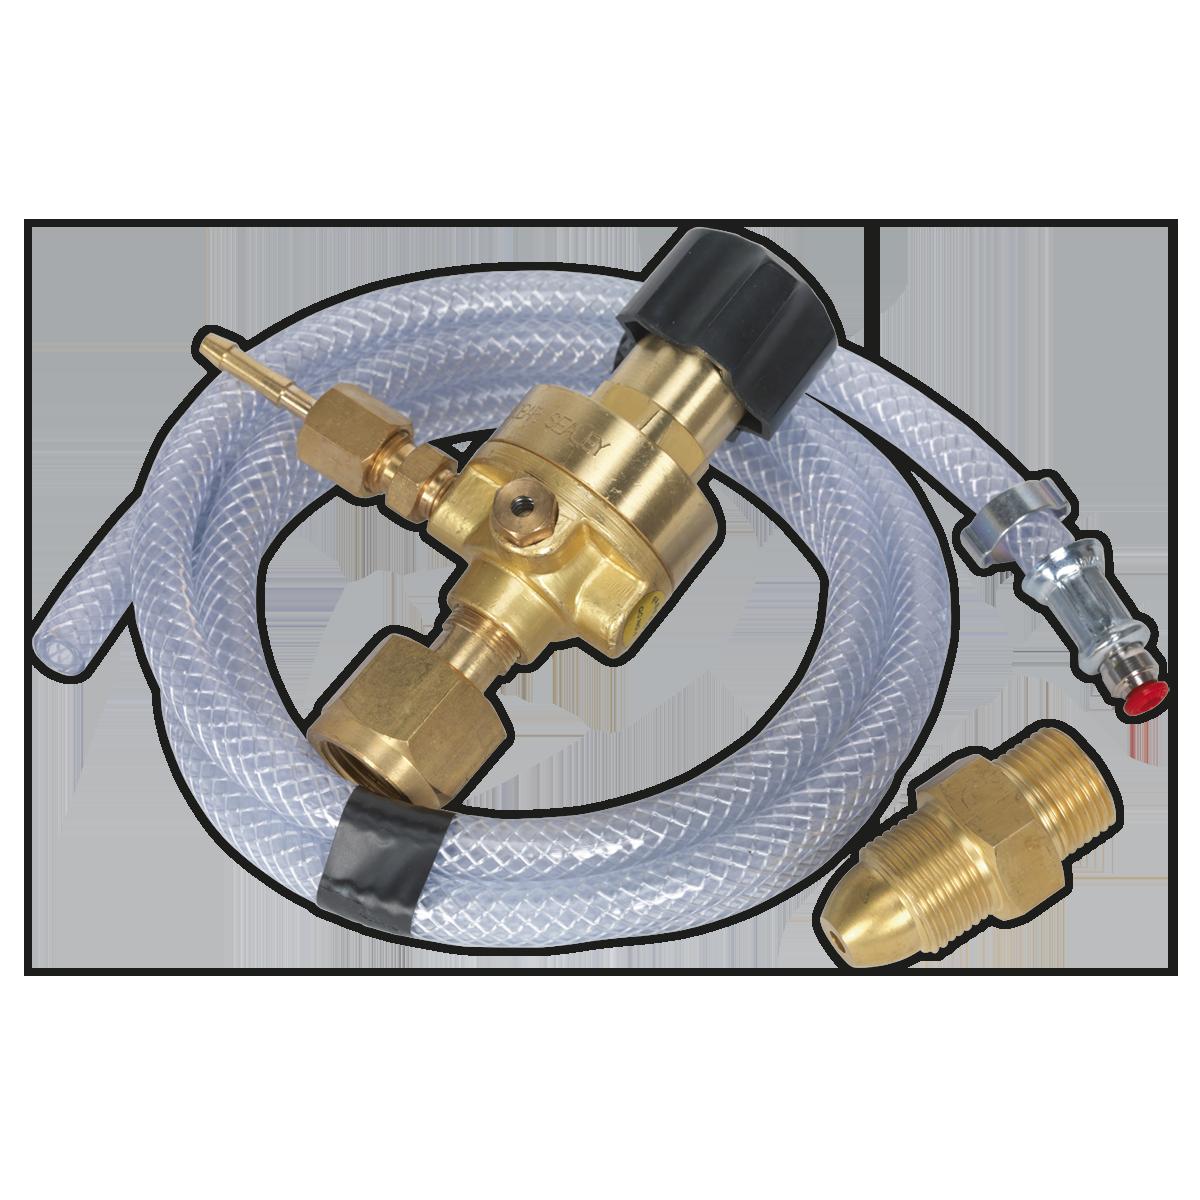 MIG Gas Regulator Kit No Gauge Regulator Industrial